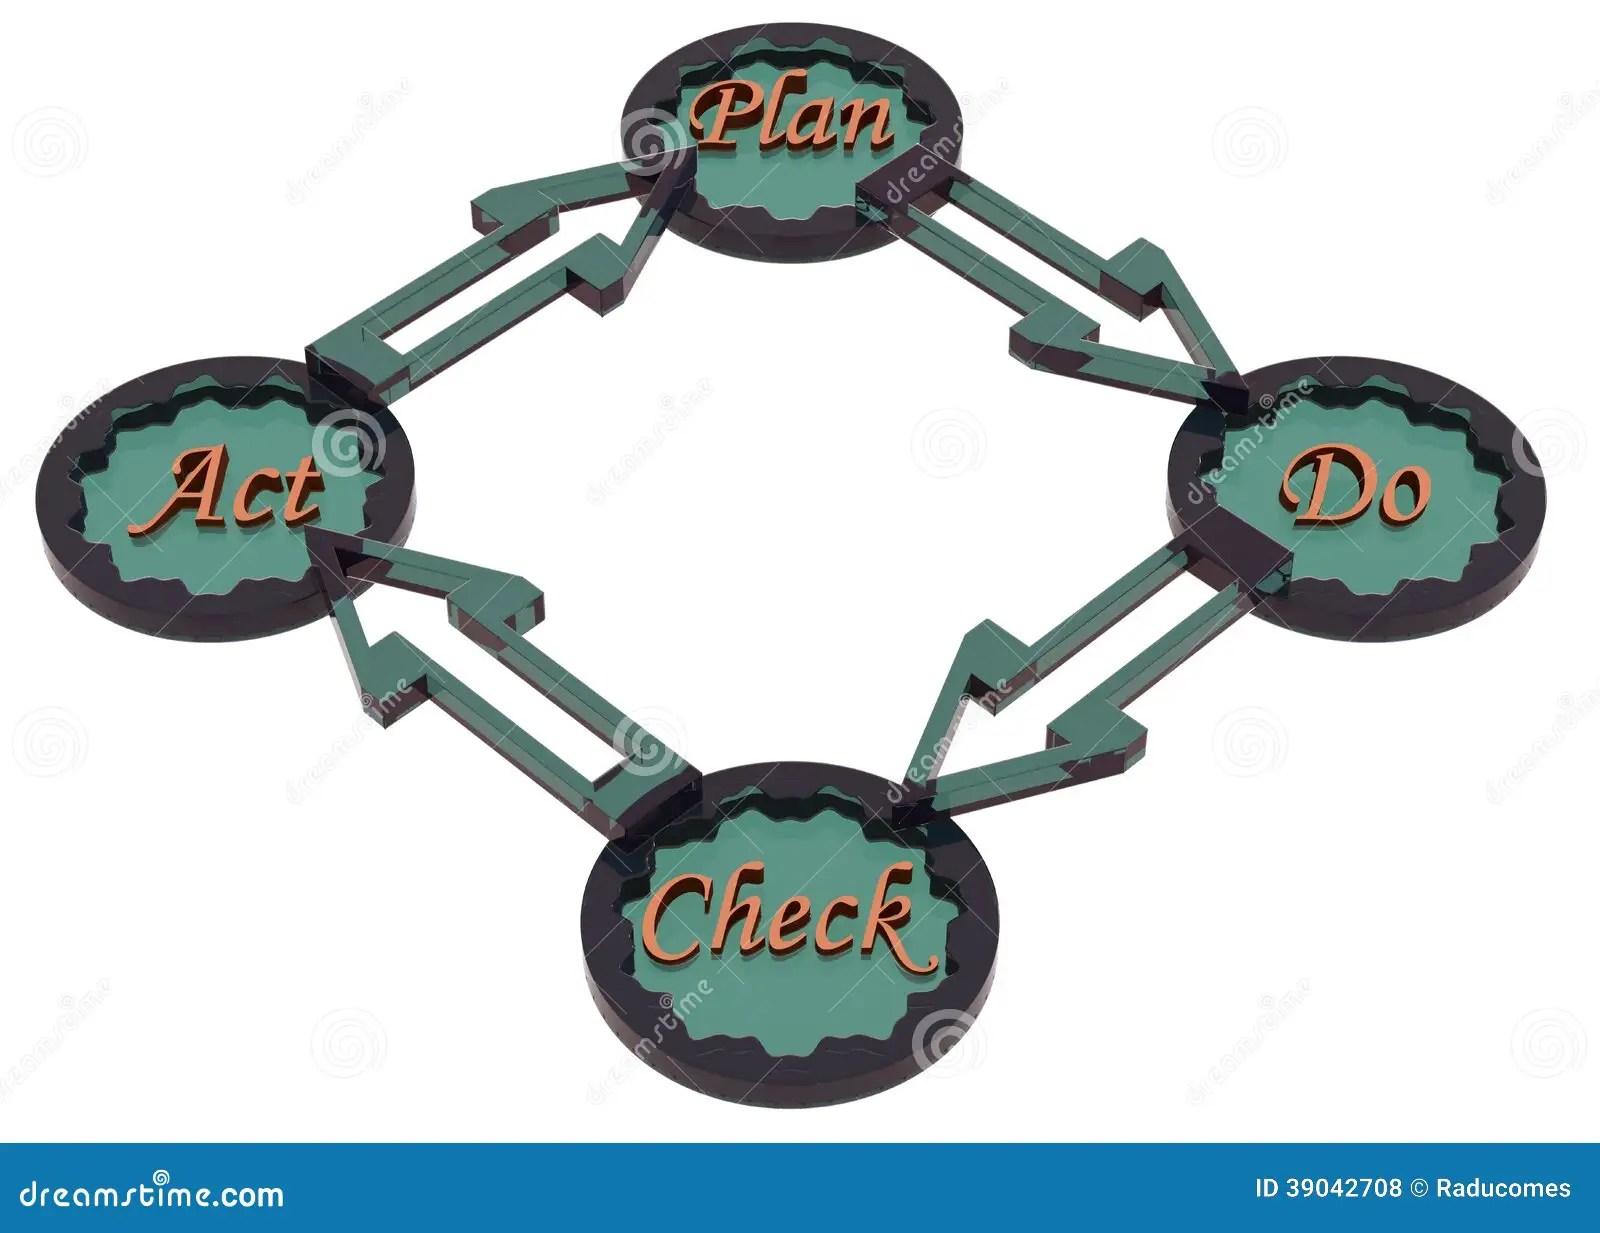 pdca cycle diagram tiger skeleton or plan do check act royalty free stock photo